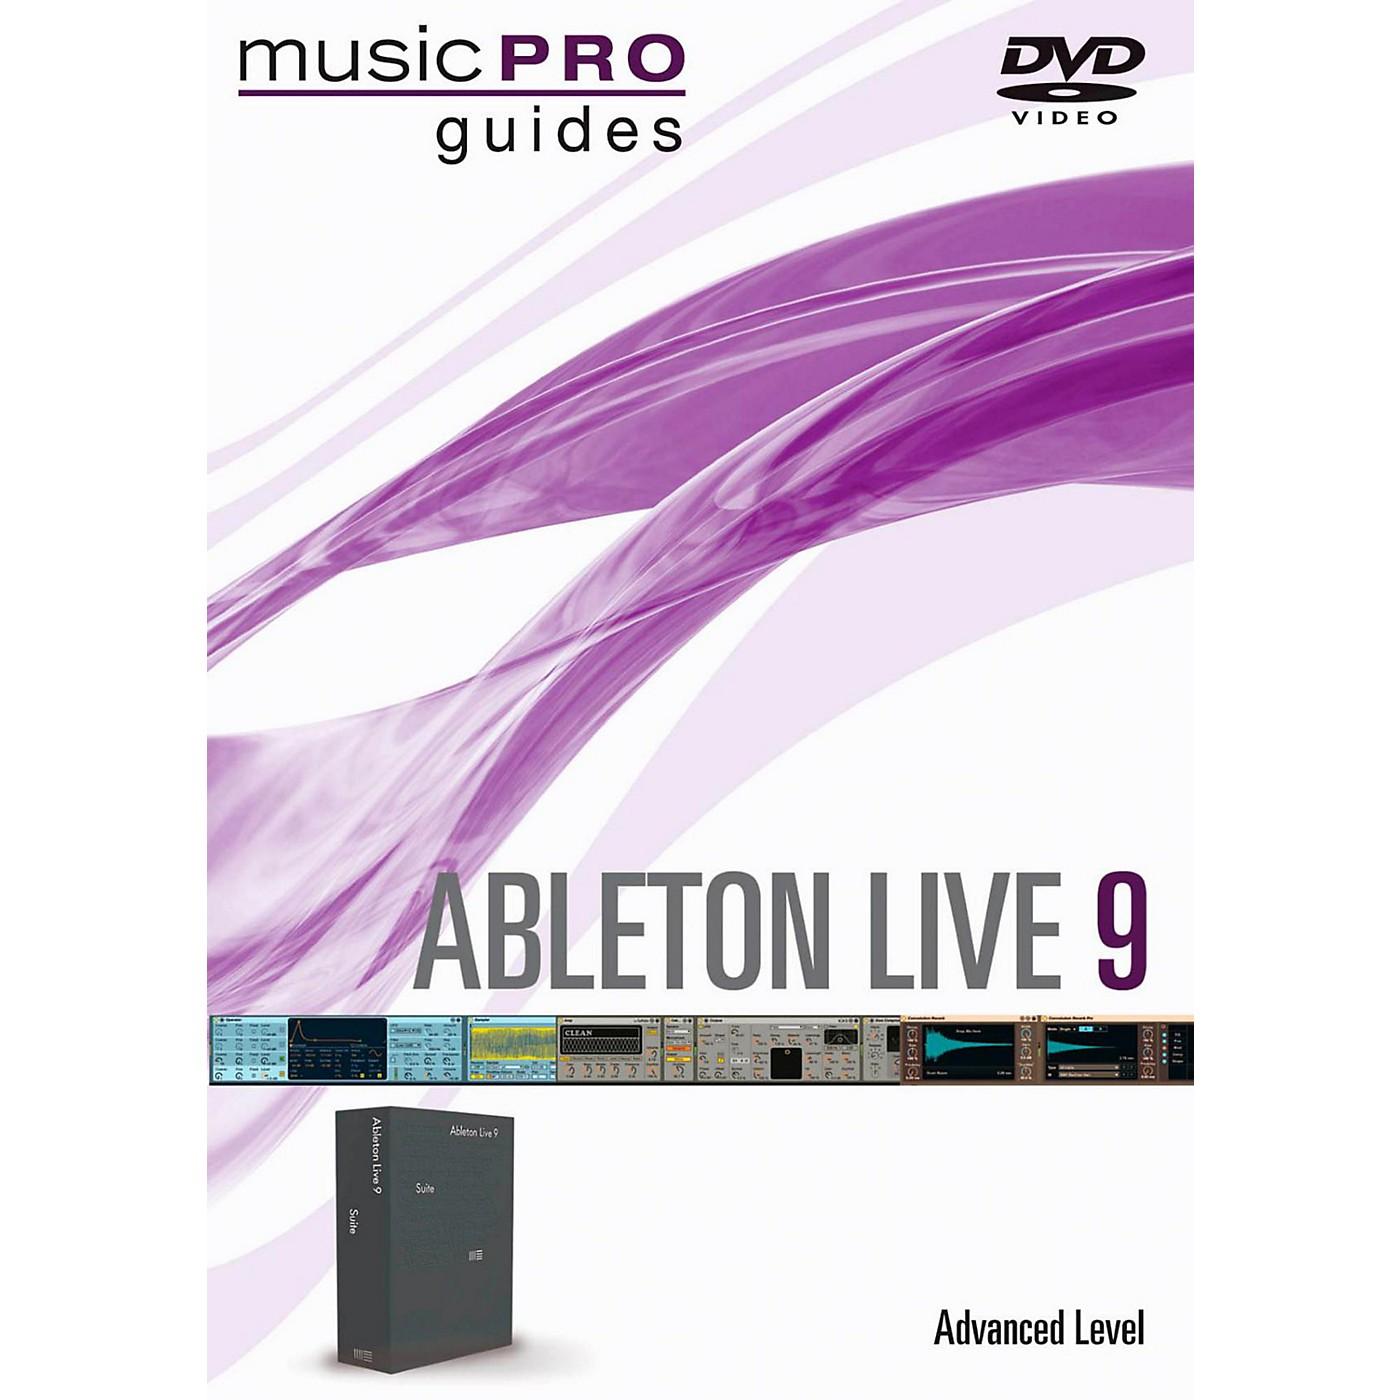 Hal Leonard Ableton Live 9 Advanced Level Music Pro Guide DVD thumbnail